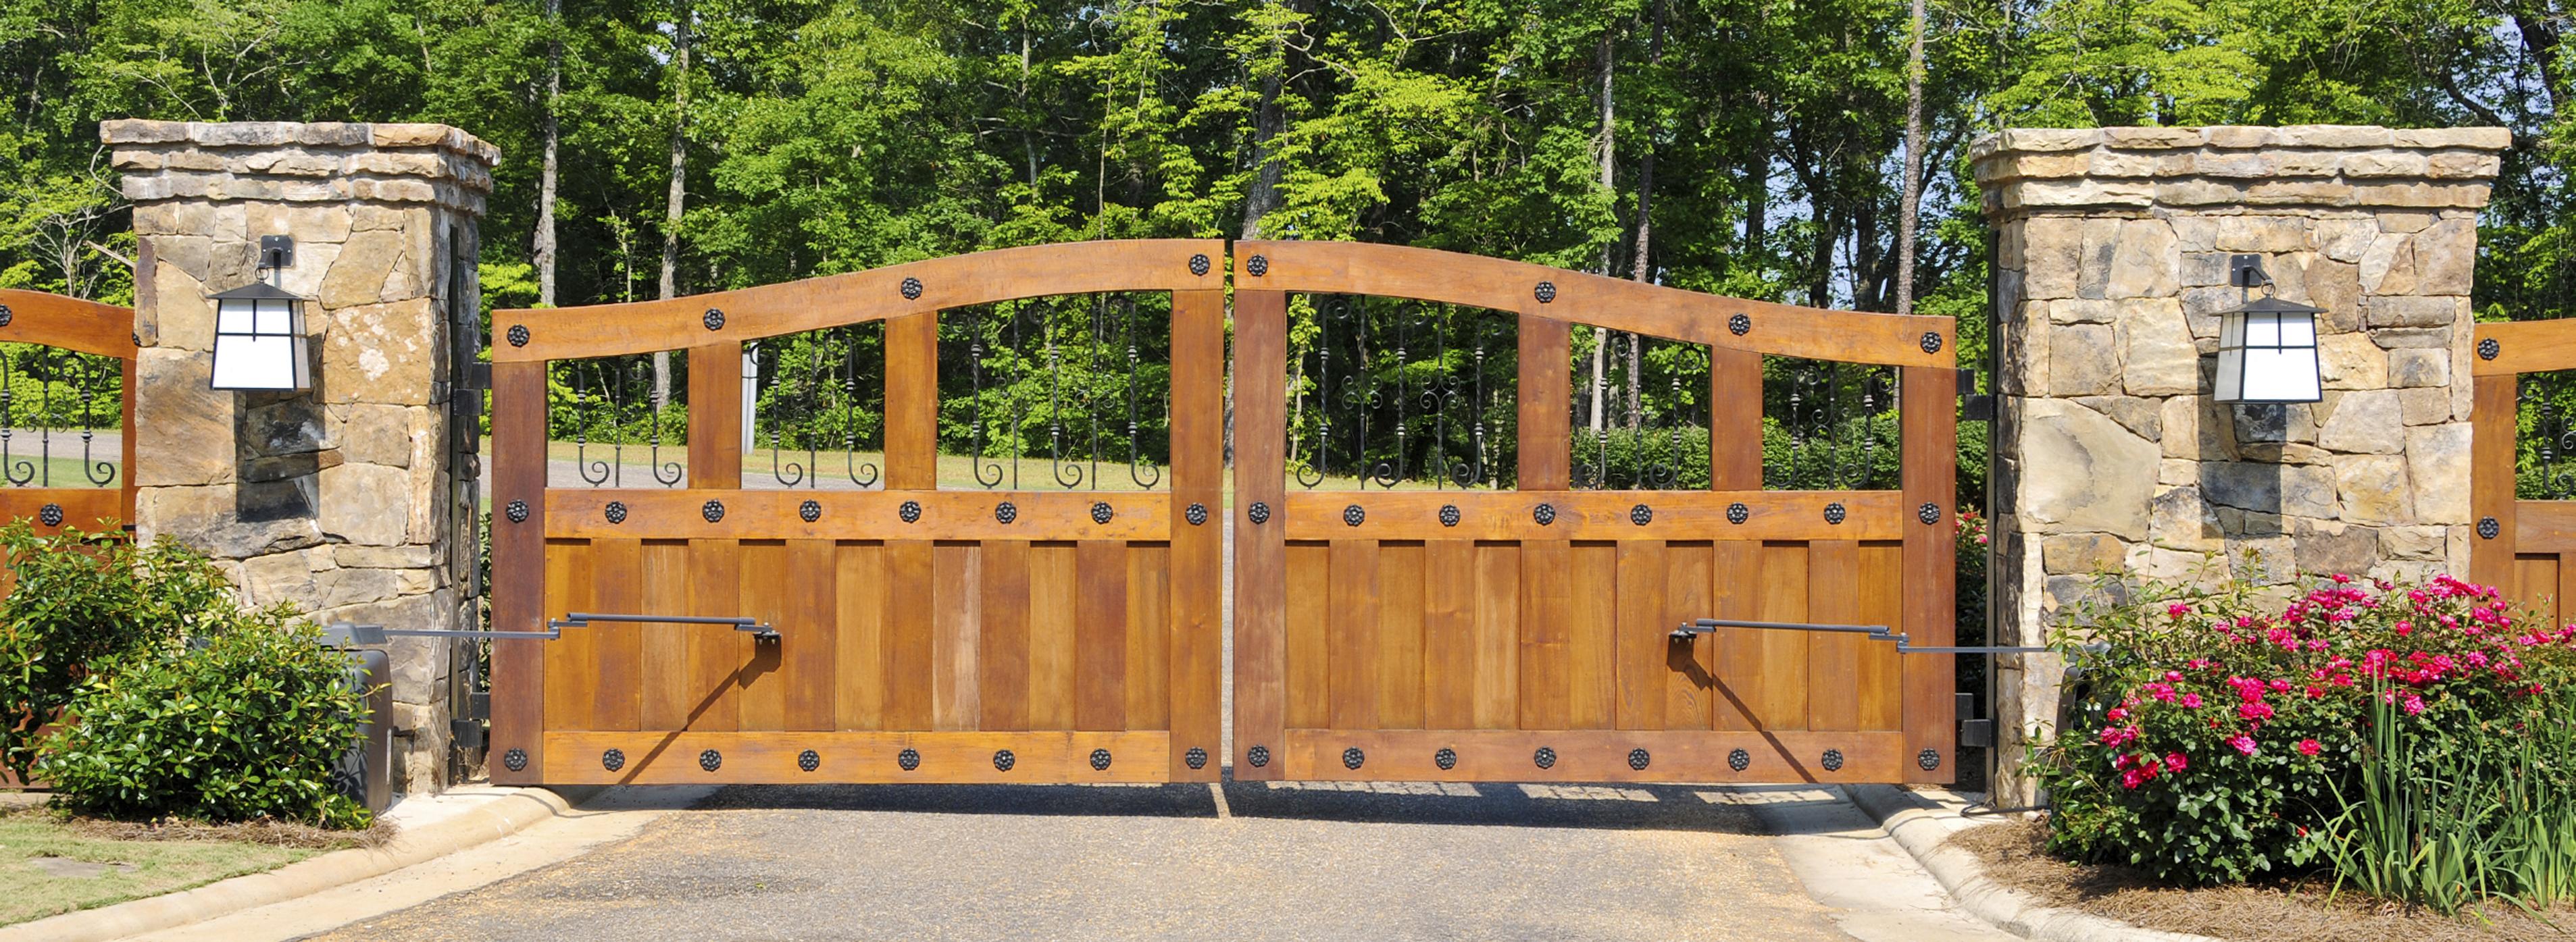 Gate Repair Greenville |Iron Gates | Driveway Gates ...